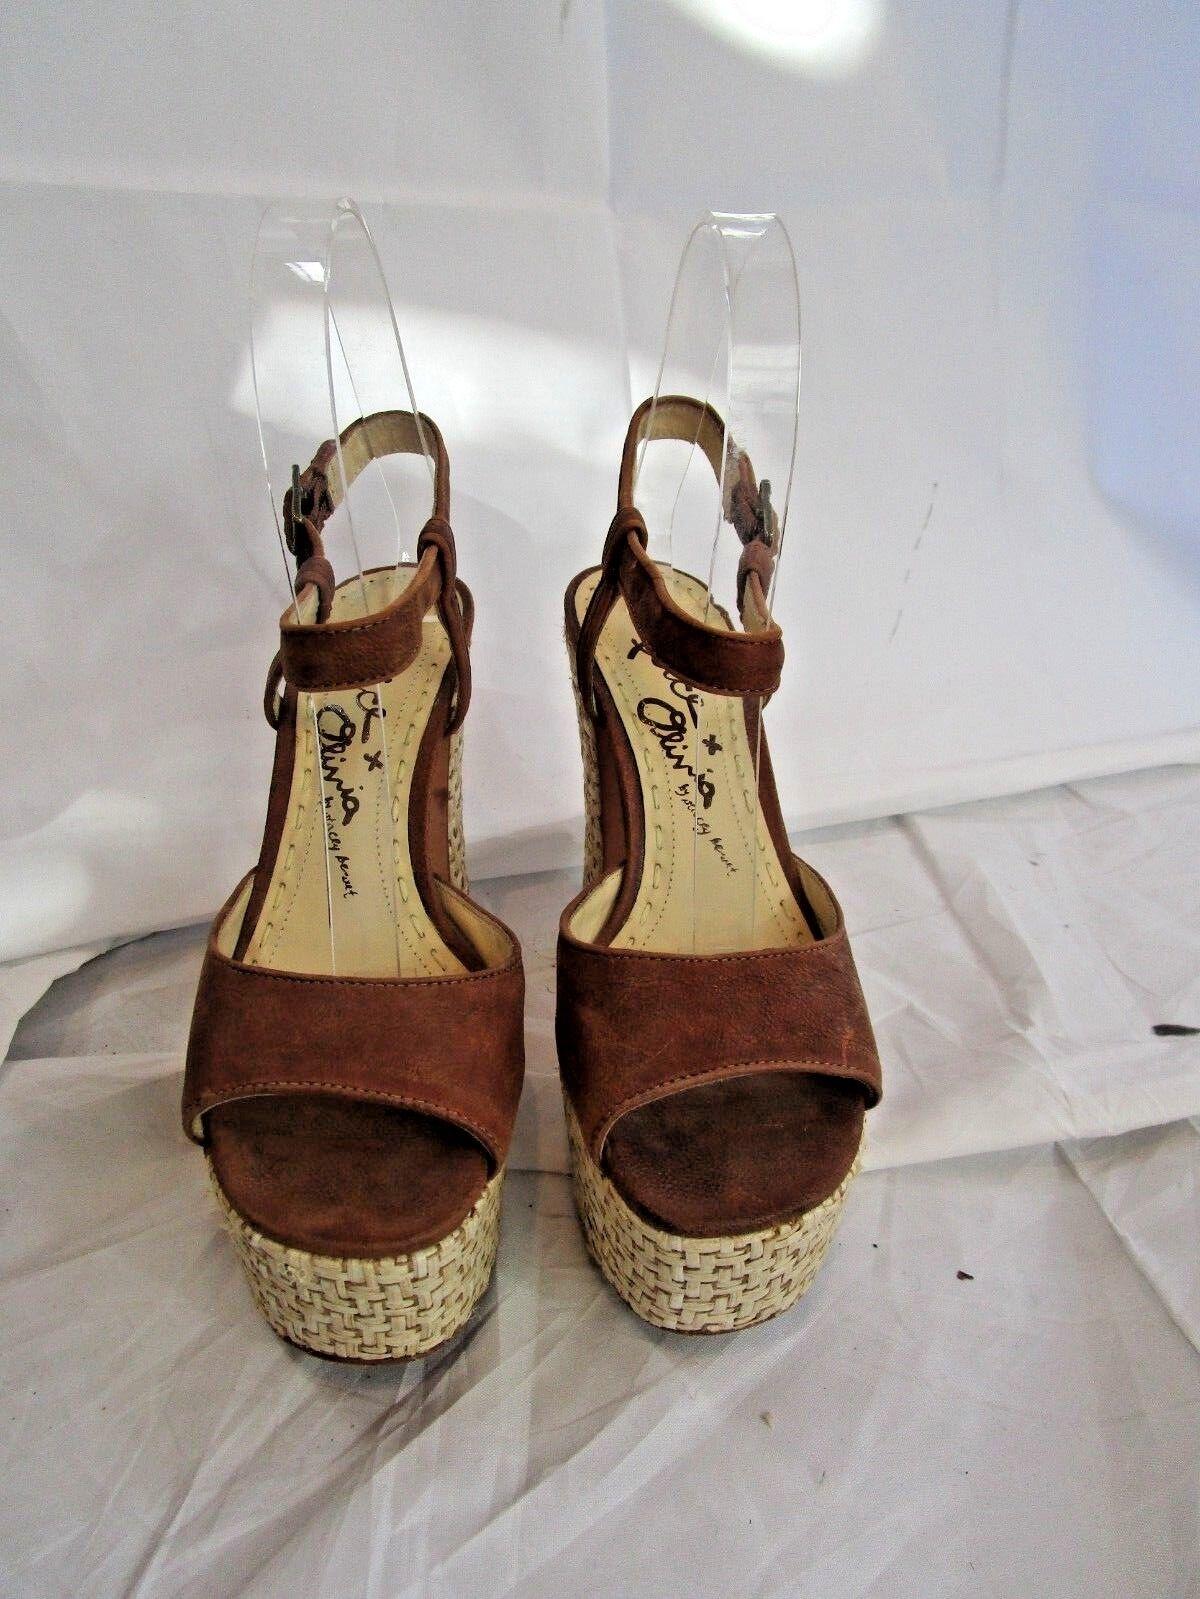 ALICE + OLIVIA braun Woven Platform Platform Platform Open Toe Heels Sandals Größe 5.5 70dd04